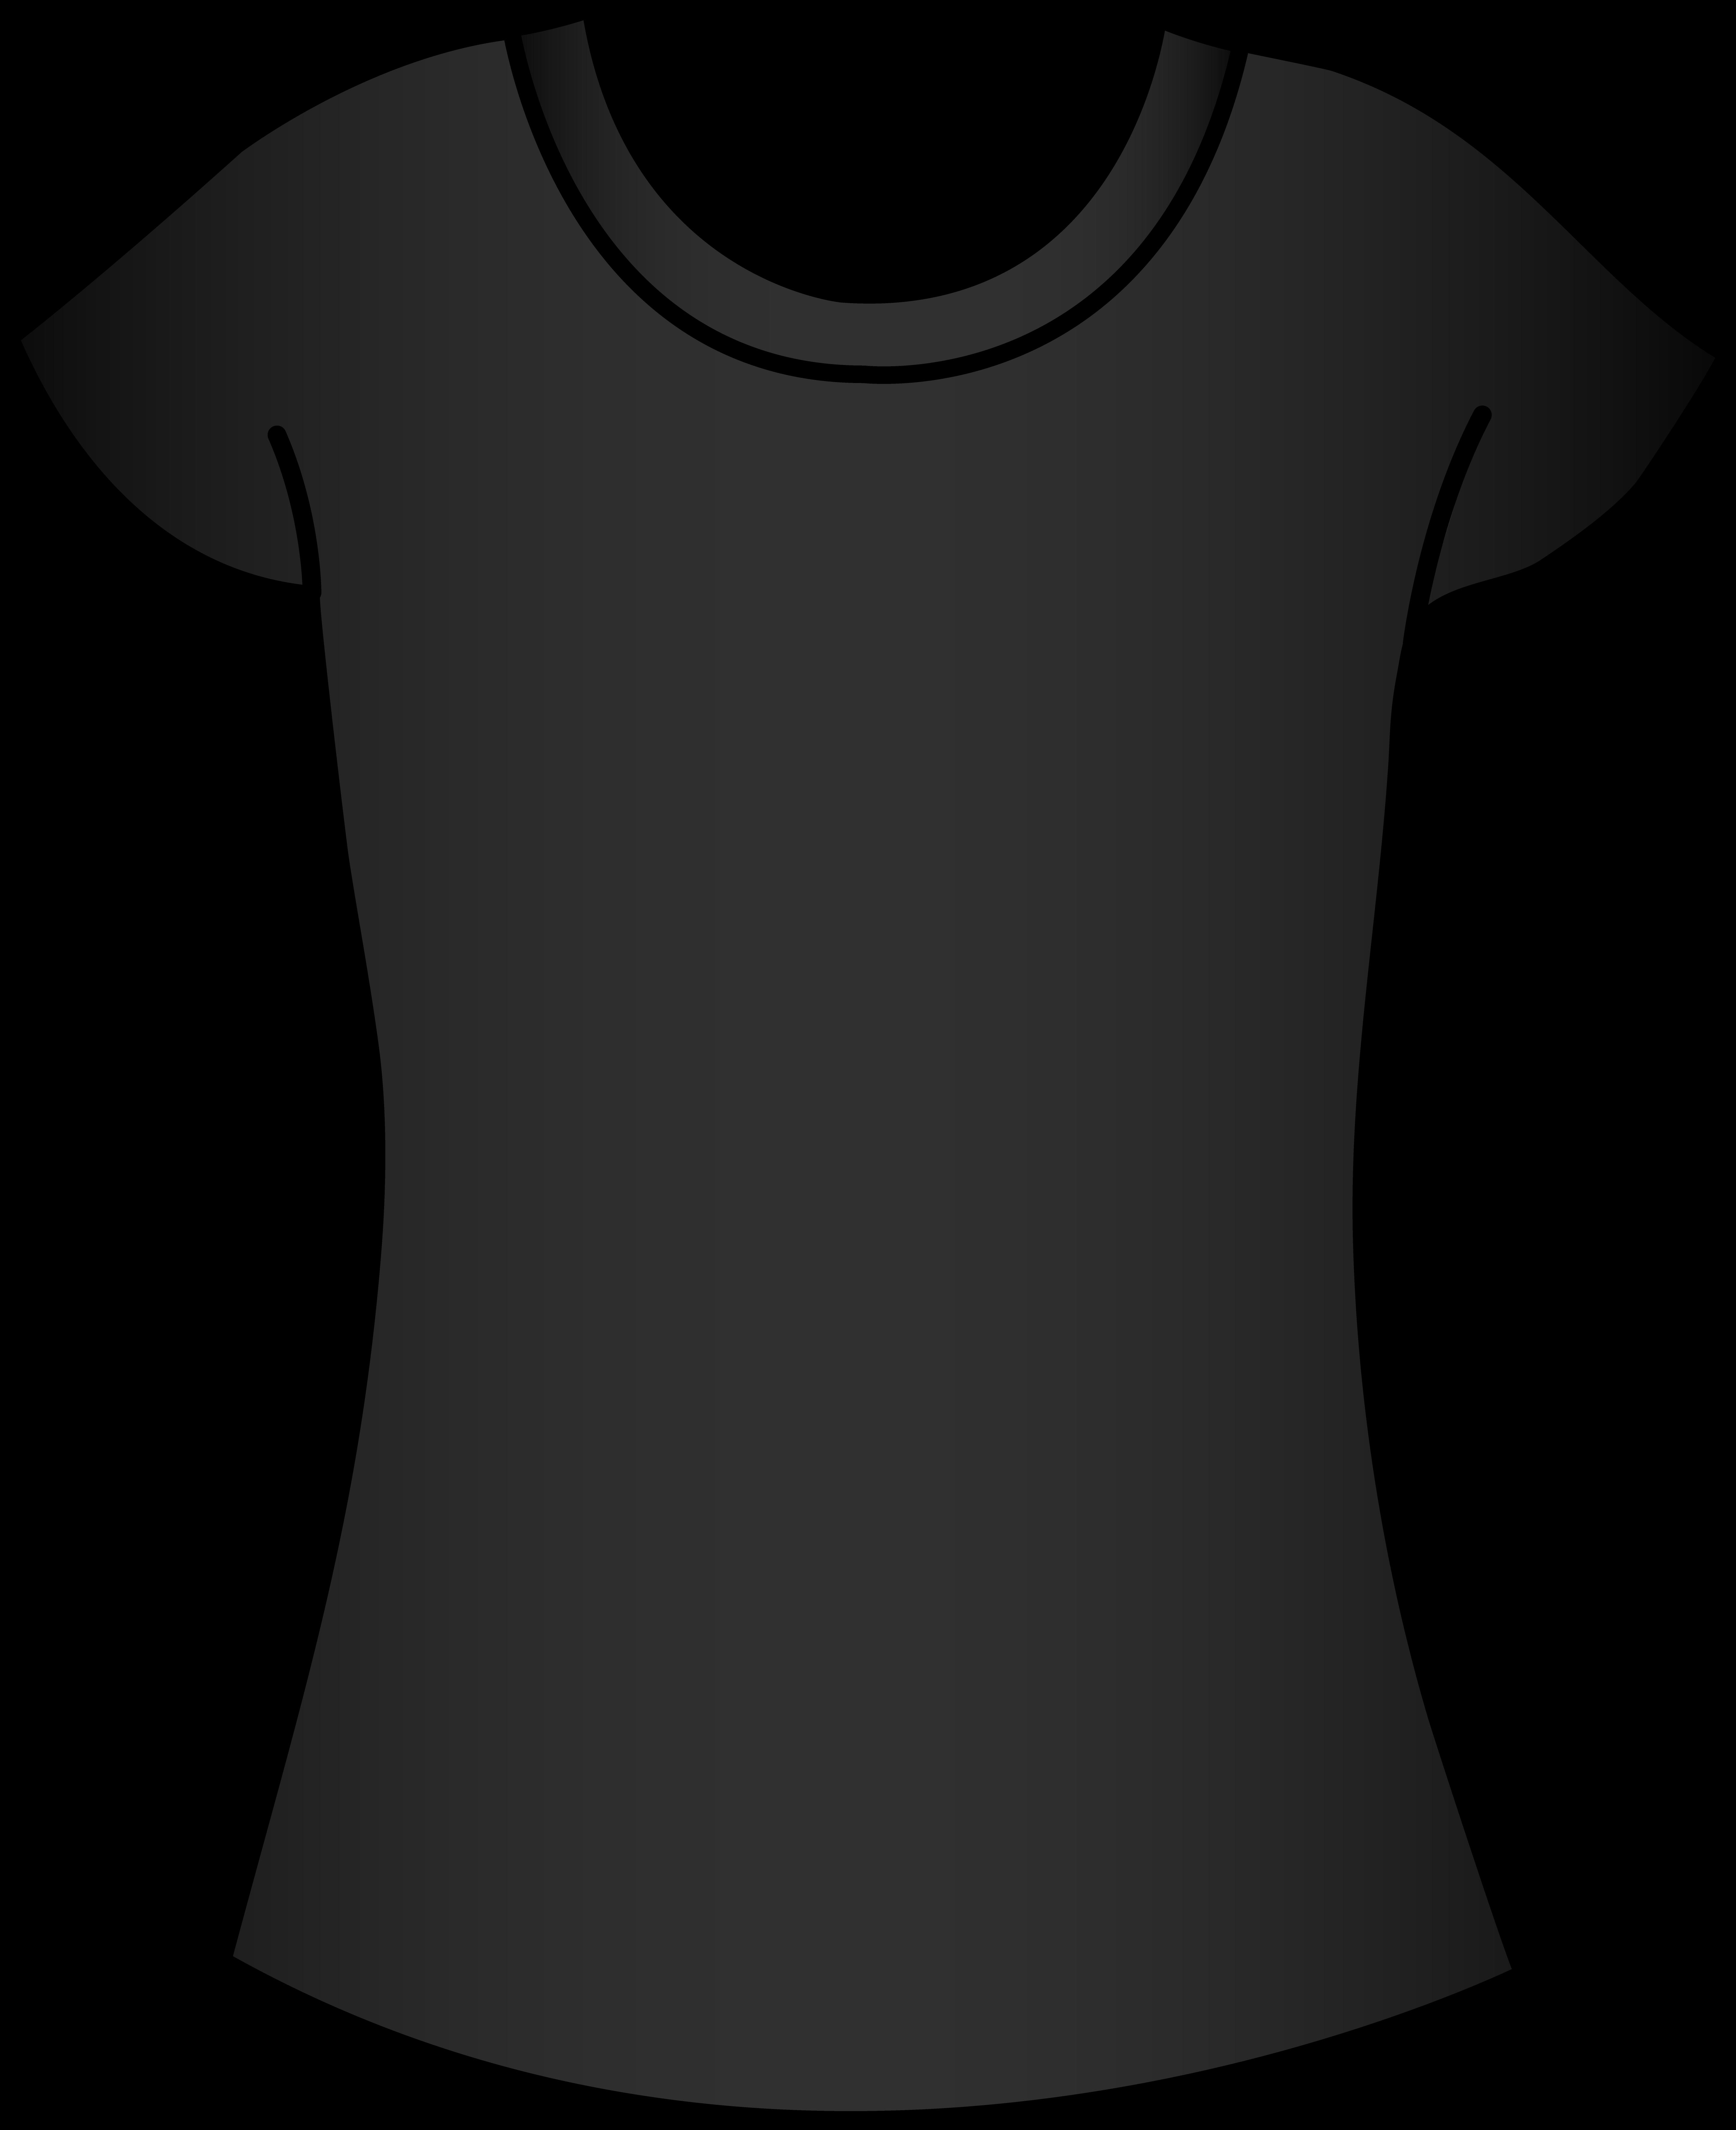 5785x7096 Womens Black T Shirt Template